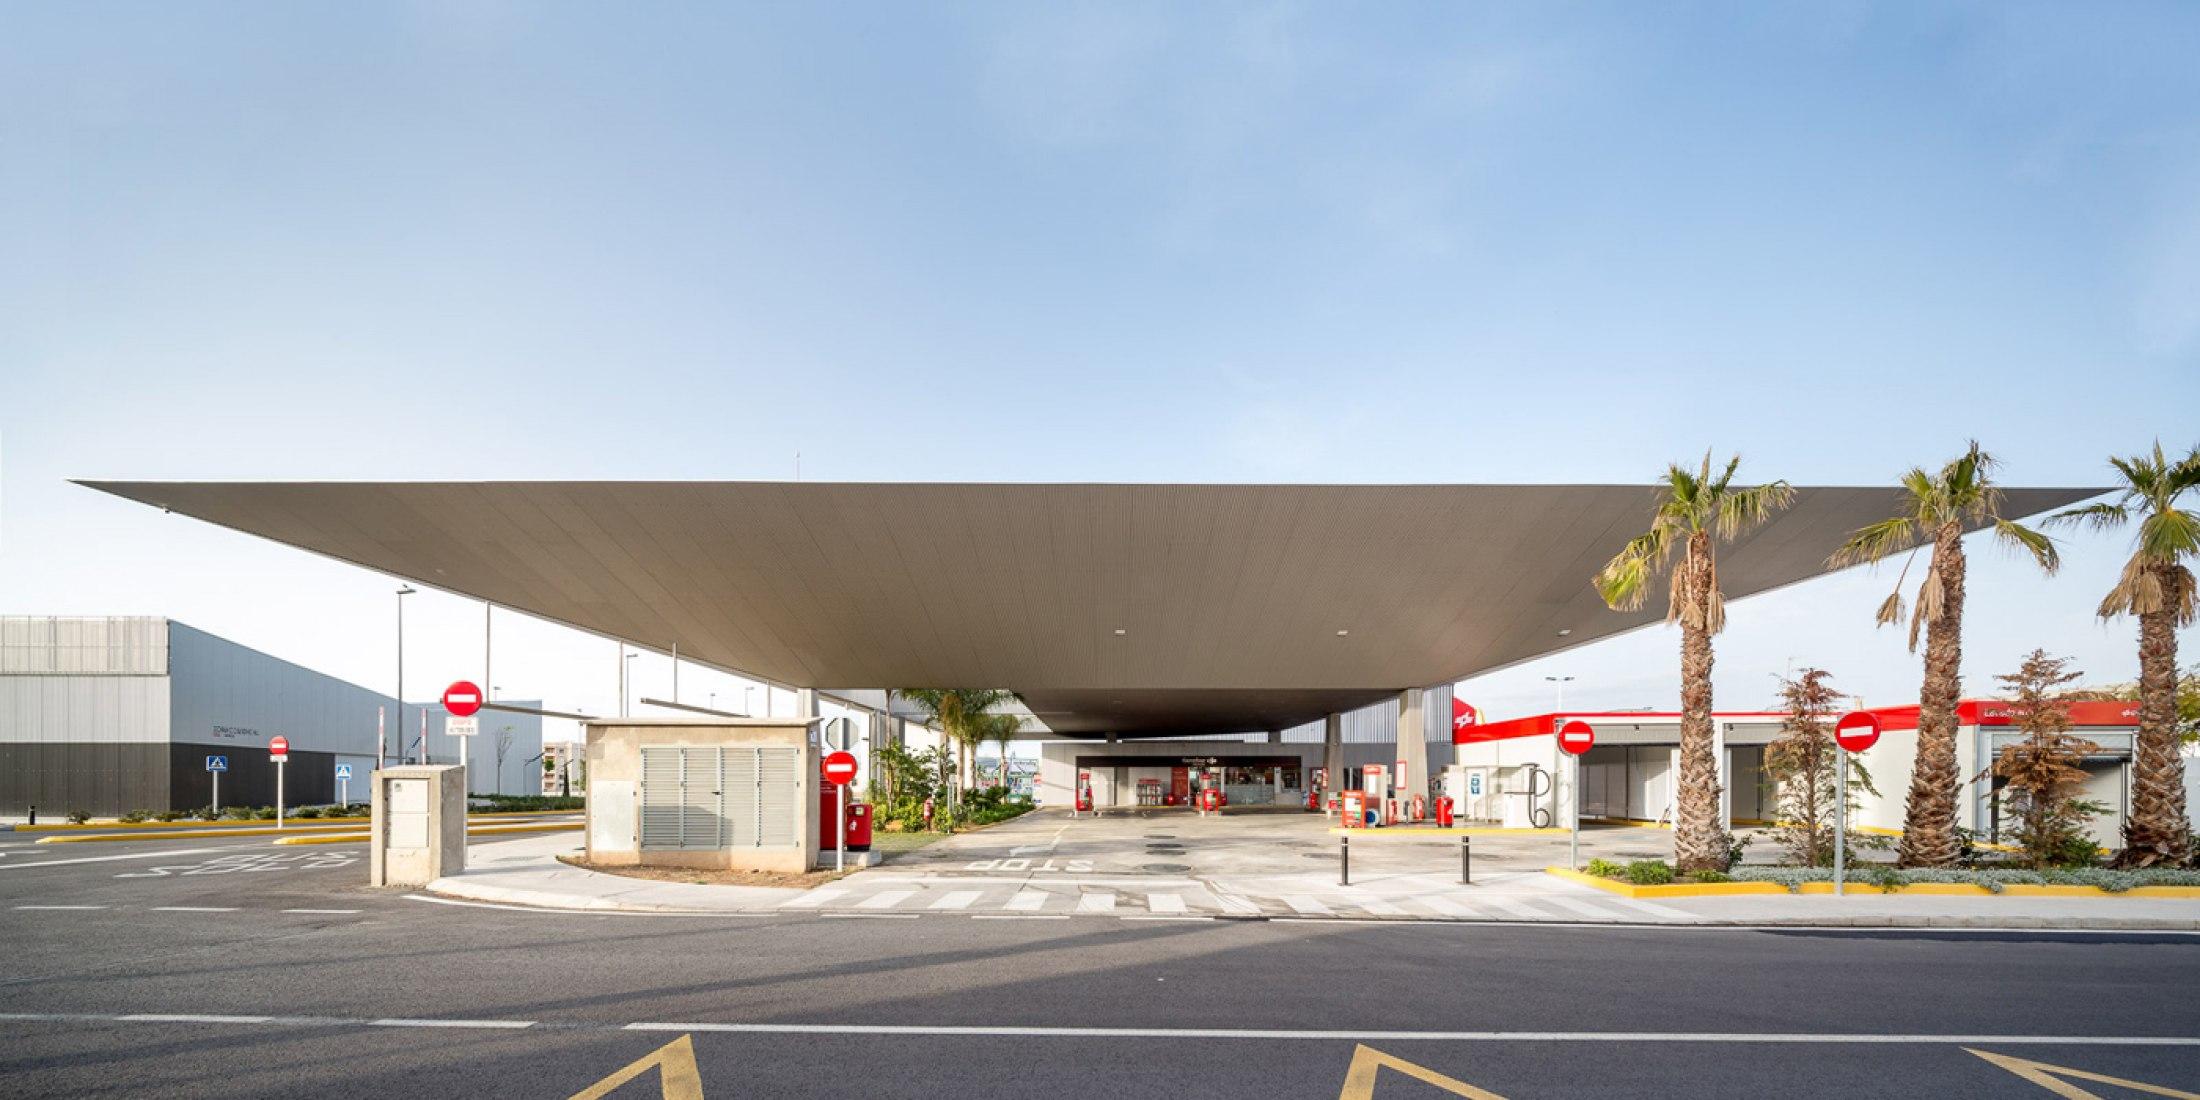 Santa Pola bus station by Manuel Lillo and Emilio Vicedo. Image © Filippo Poli